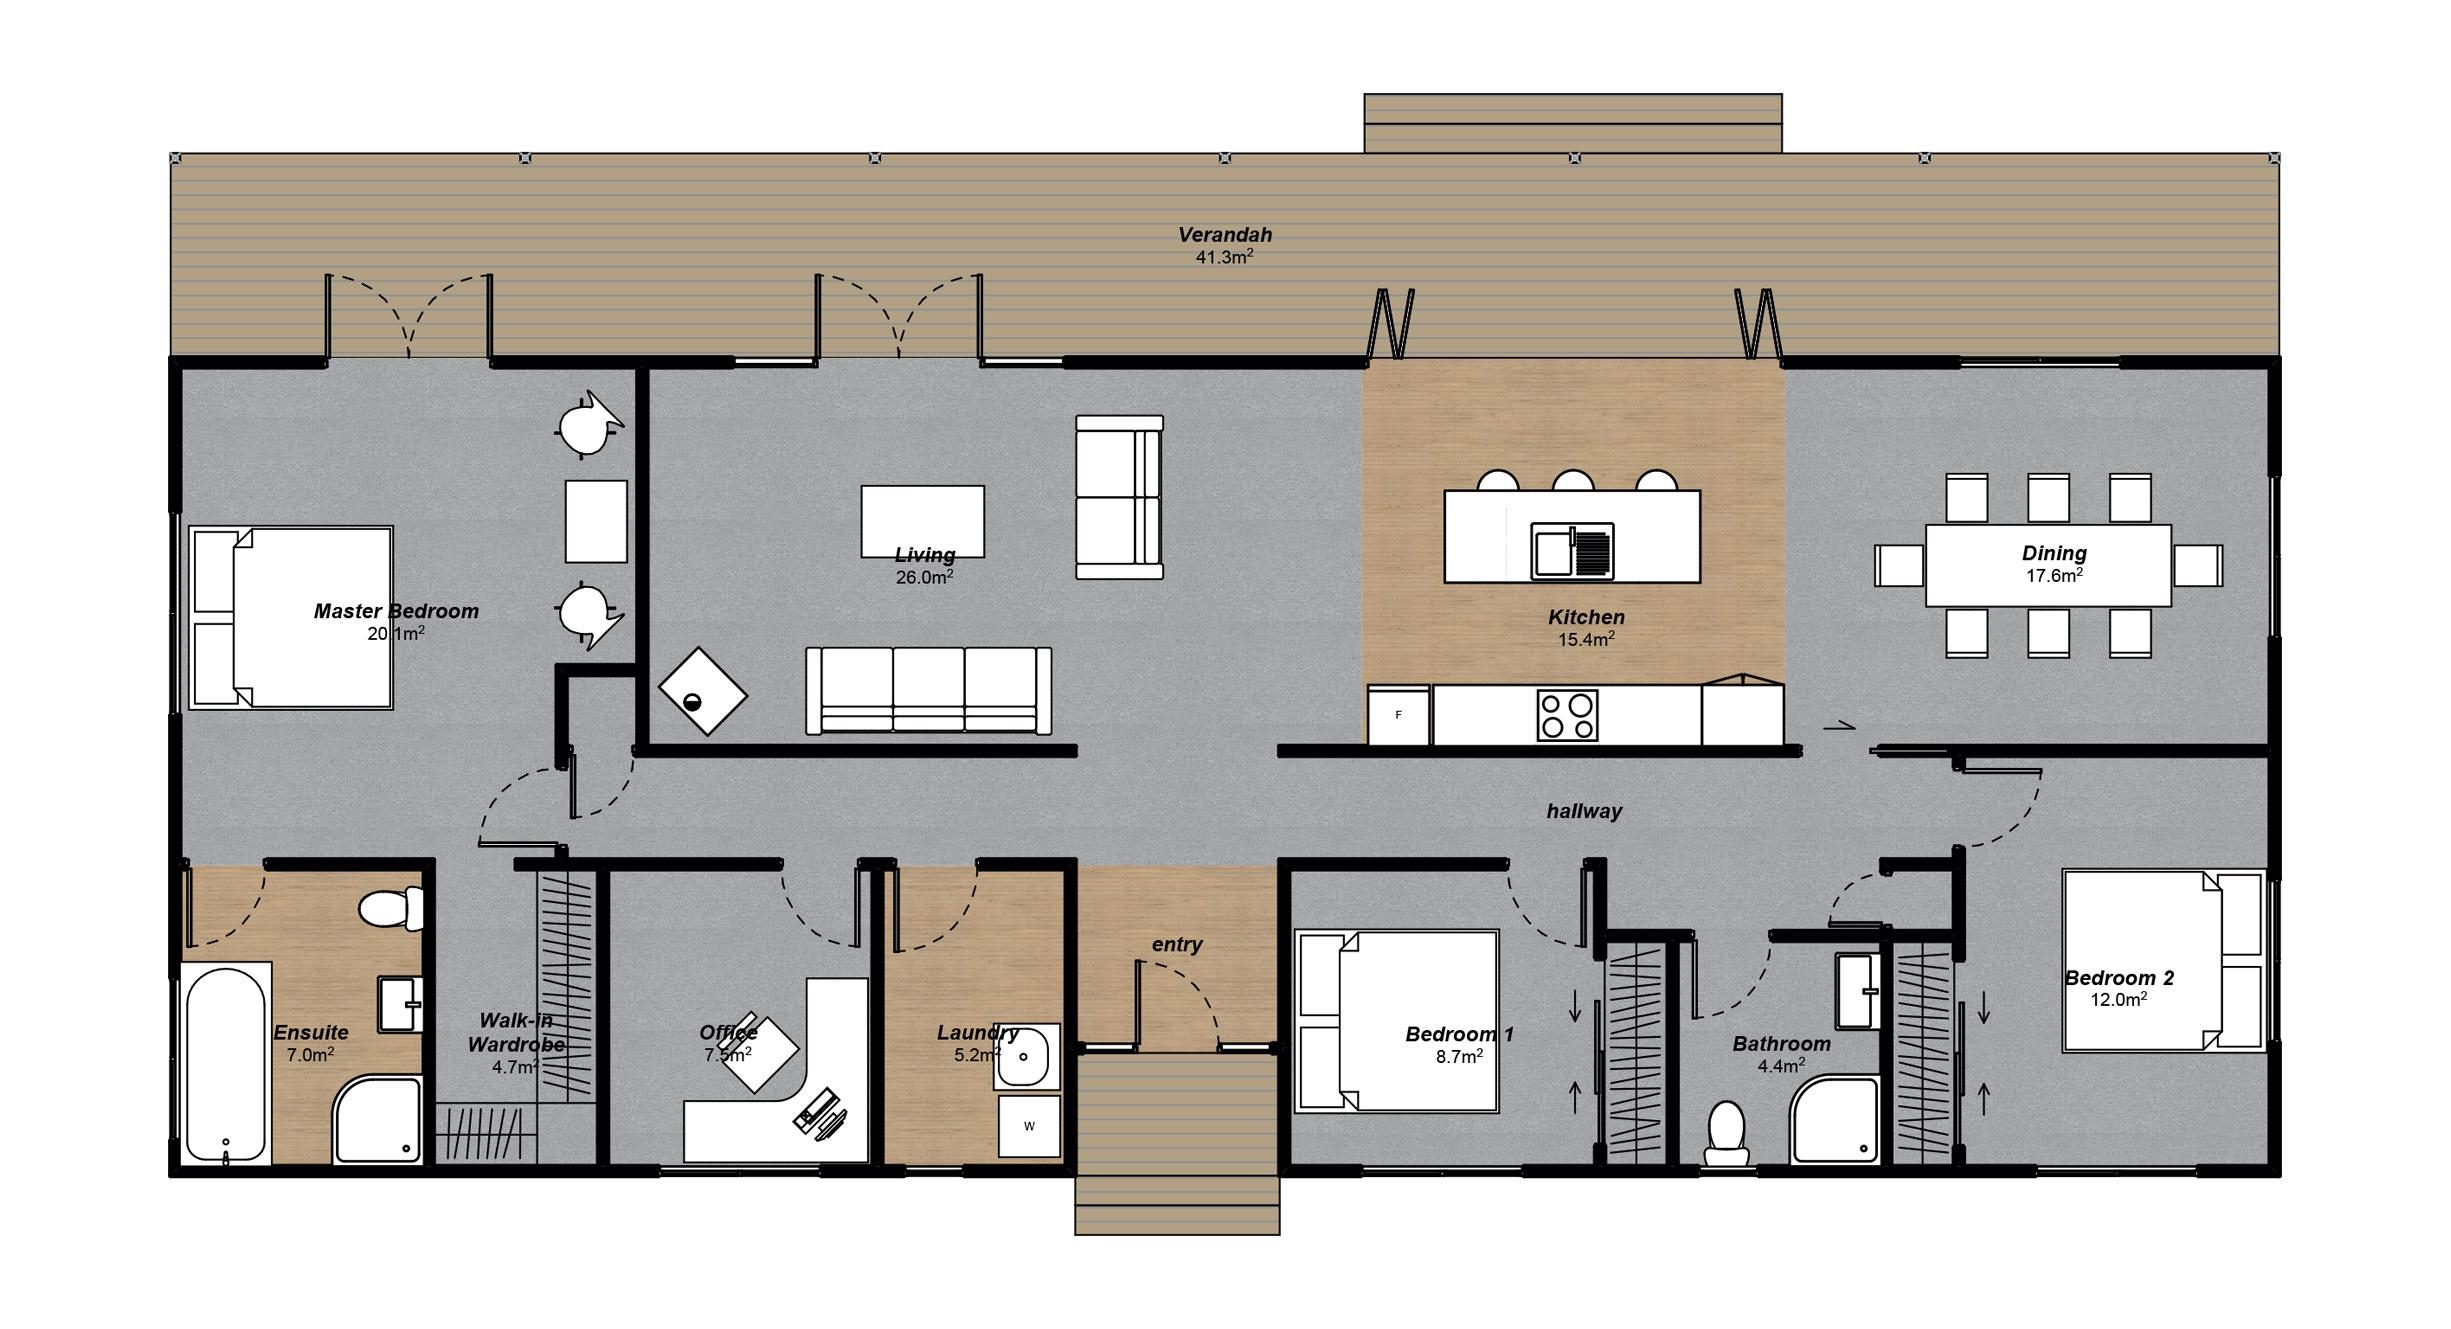 Lindis 3 bedroom floorplan